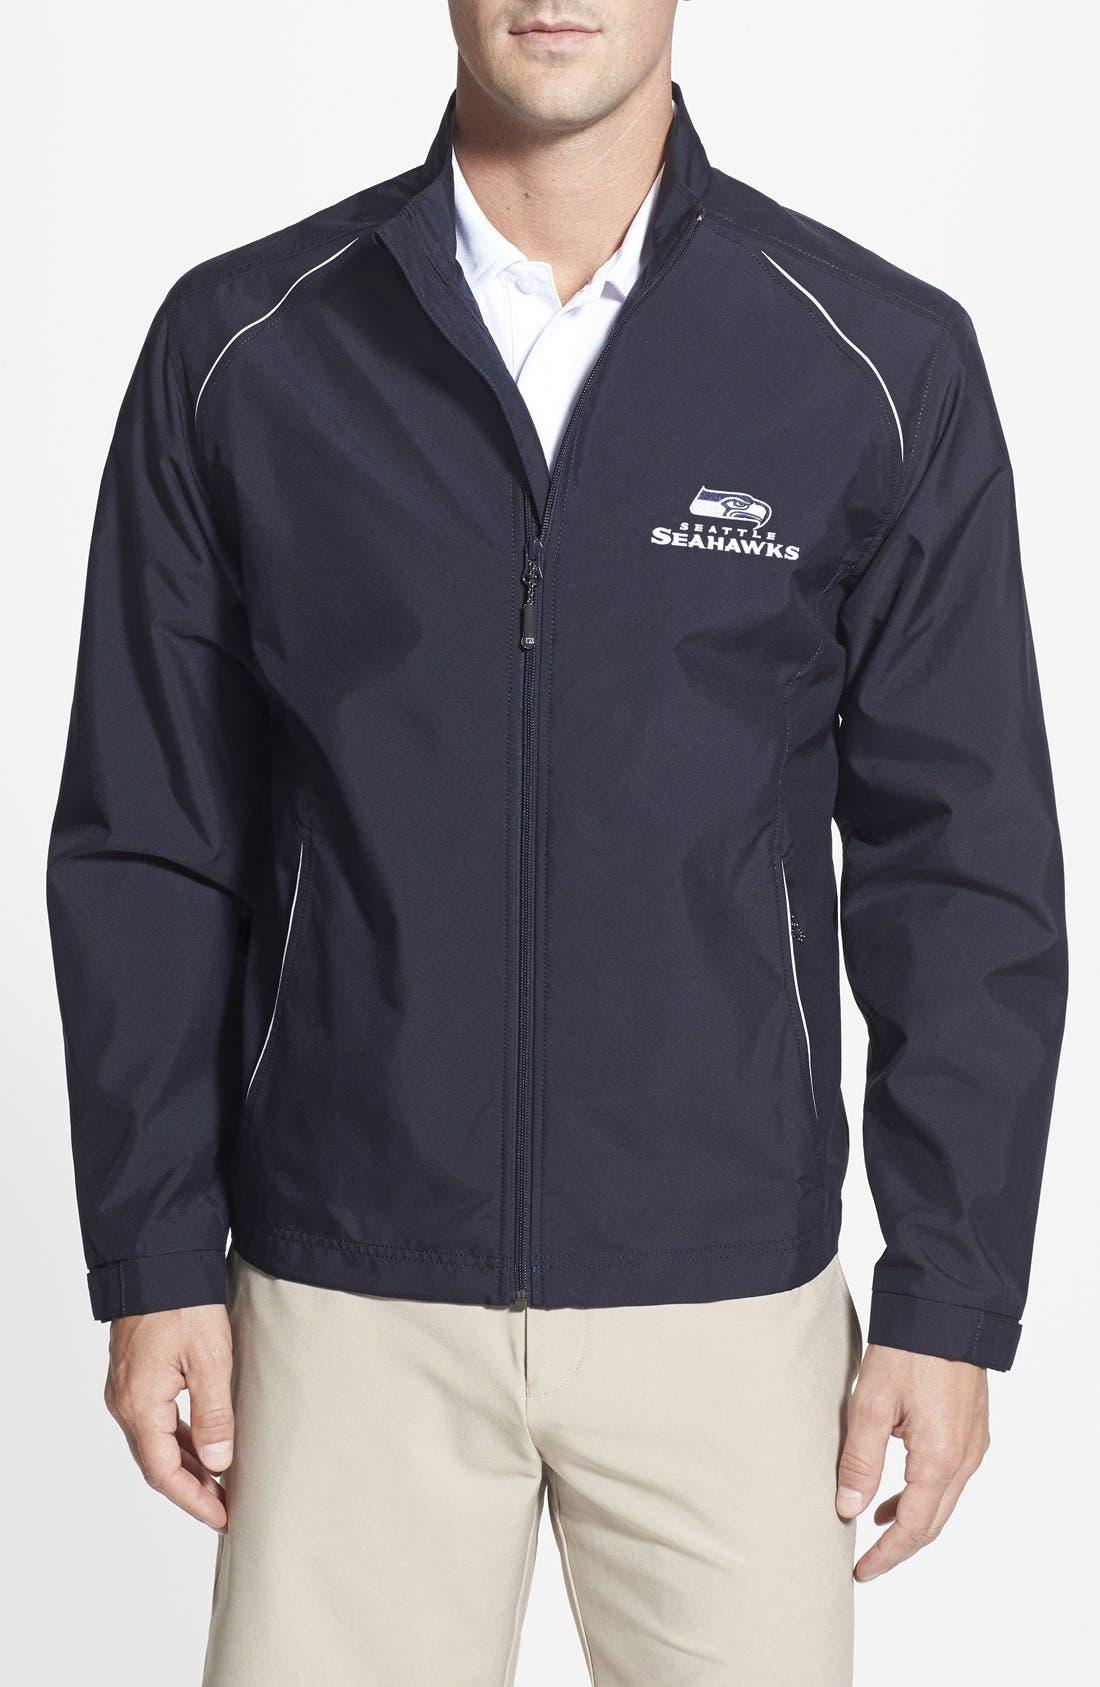 Seattle Seahawks - Beacon WeatherTec Wind & Water Resistant Jacket,                         Main,                         color, 420